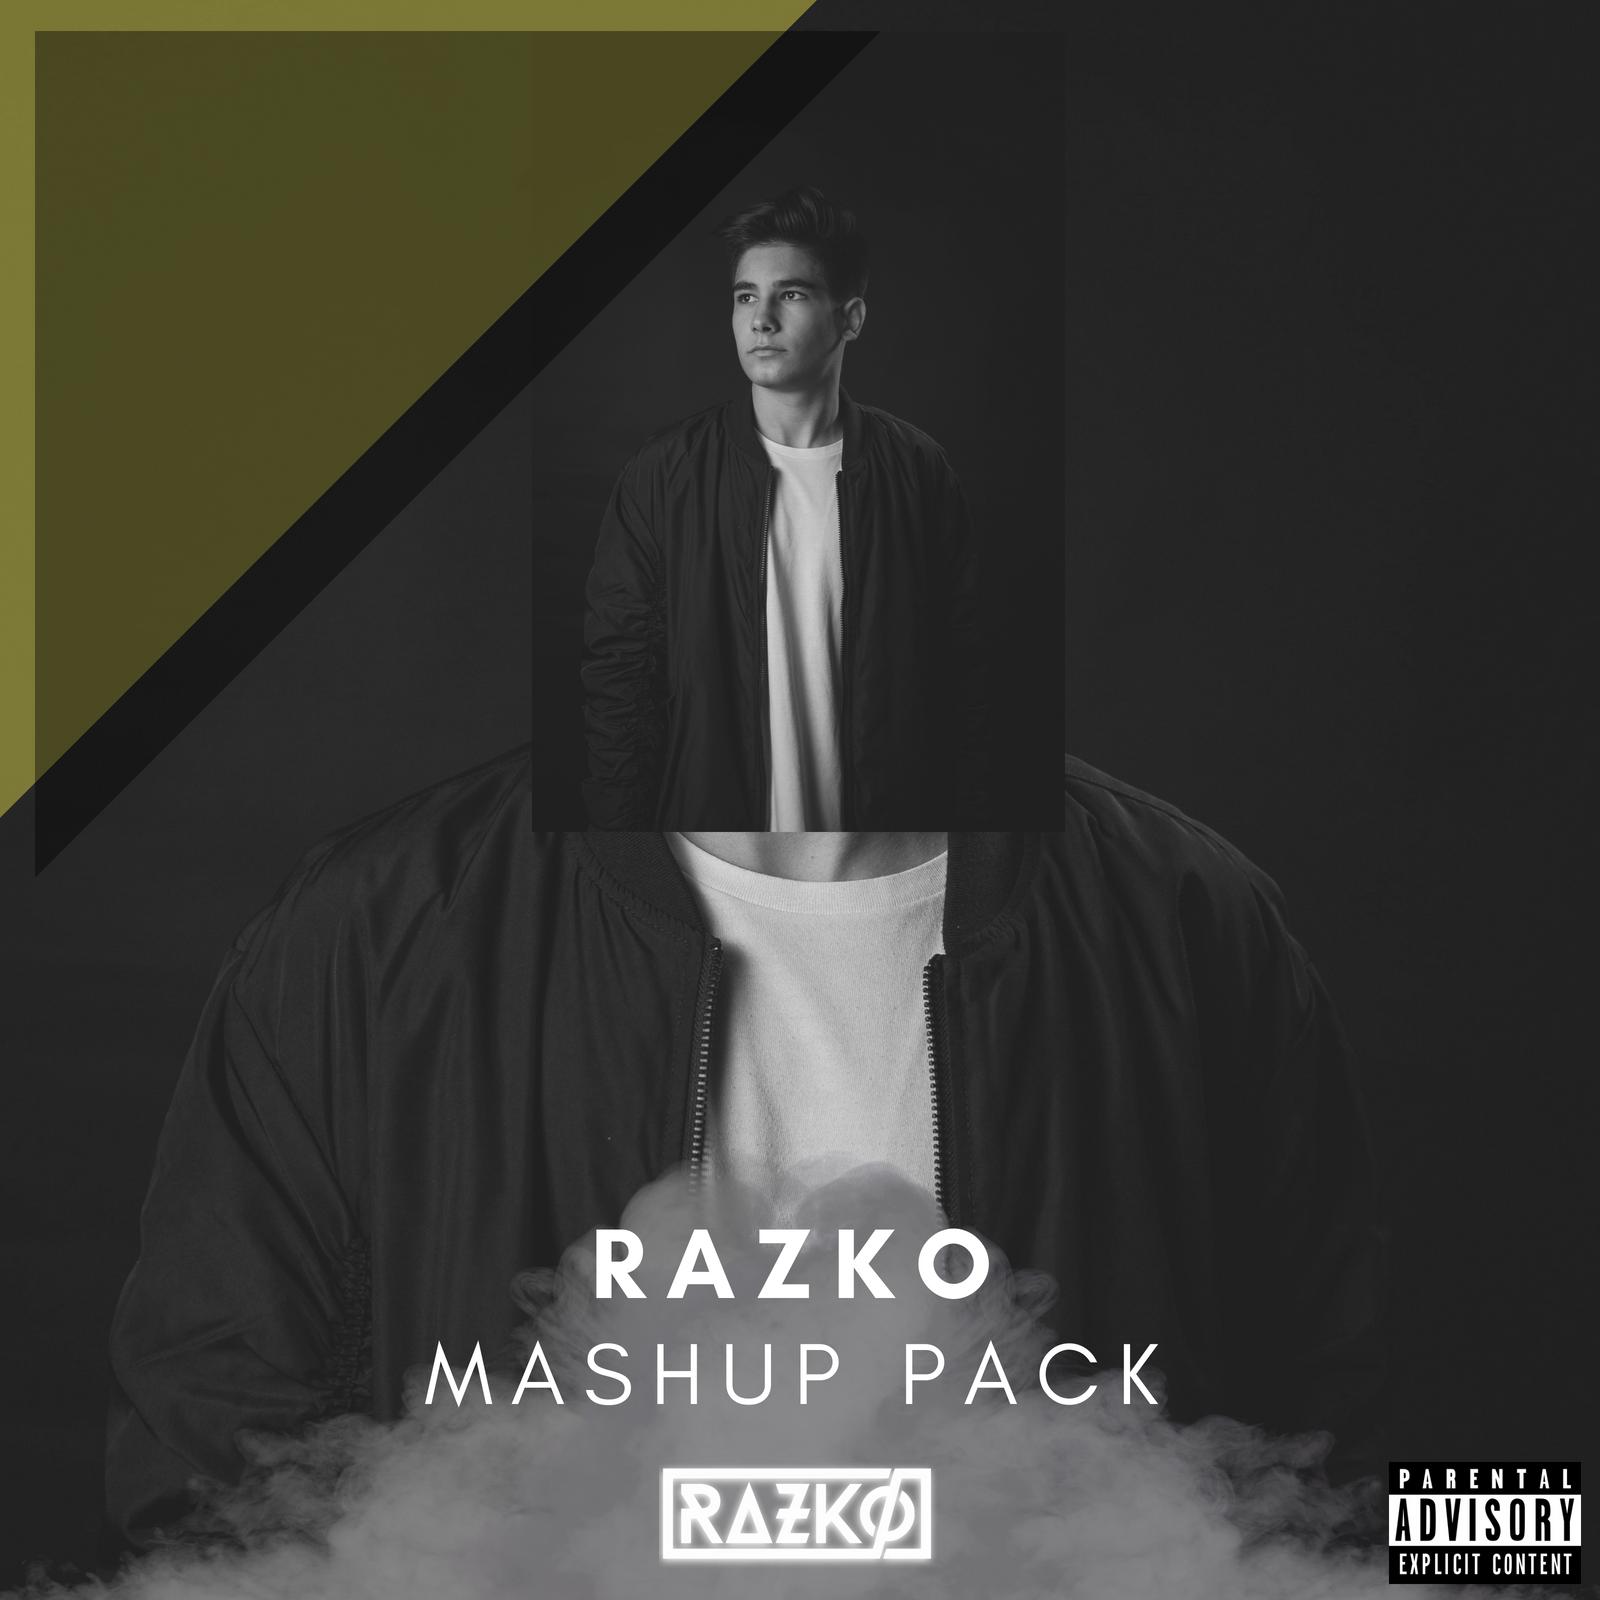 Razko Summer2k18 Mashup Pack